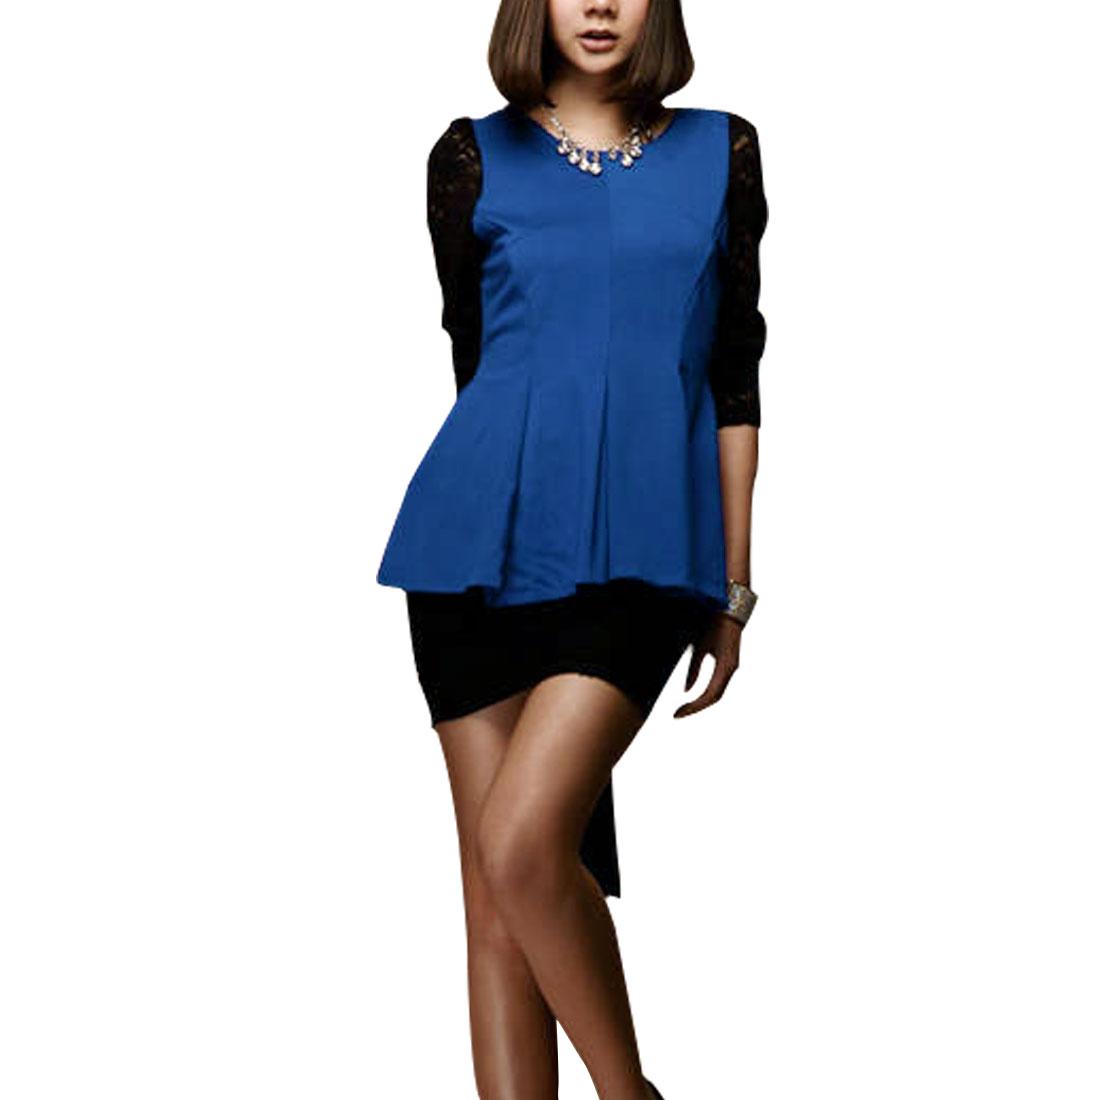 Lady Panel Lace Back Zipper Round Neck Fashion Tops Blouses Blue XS